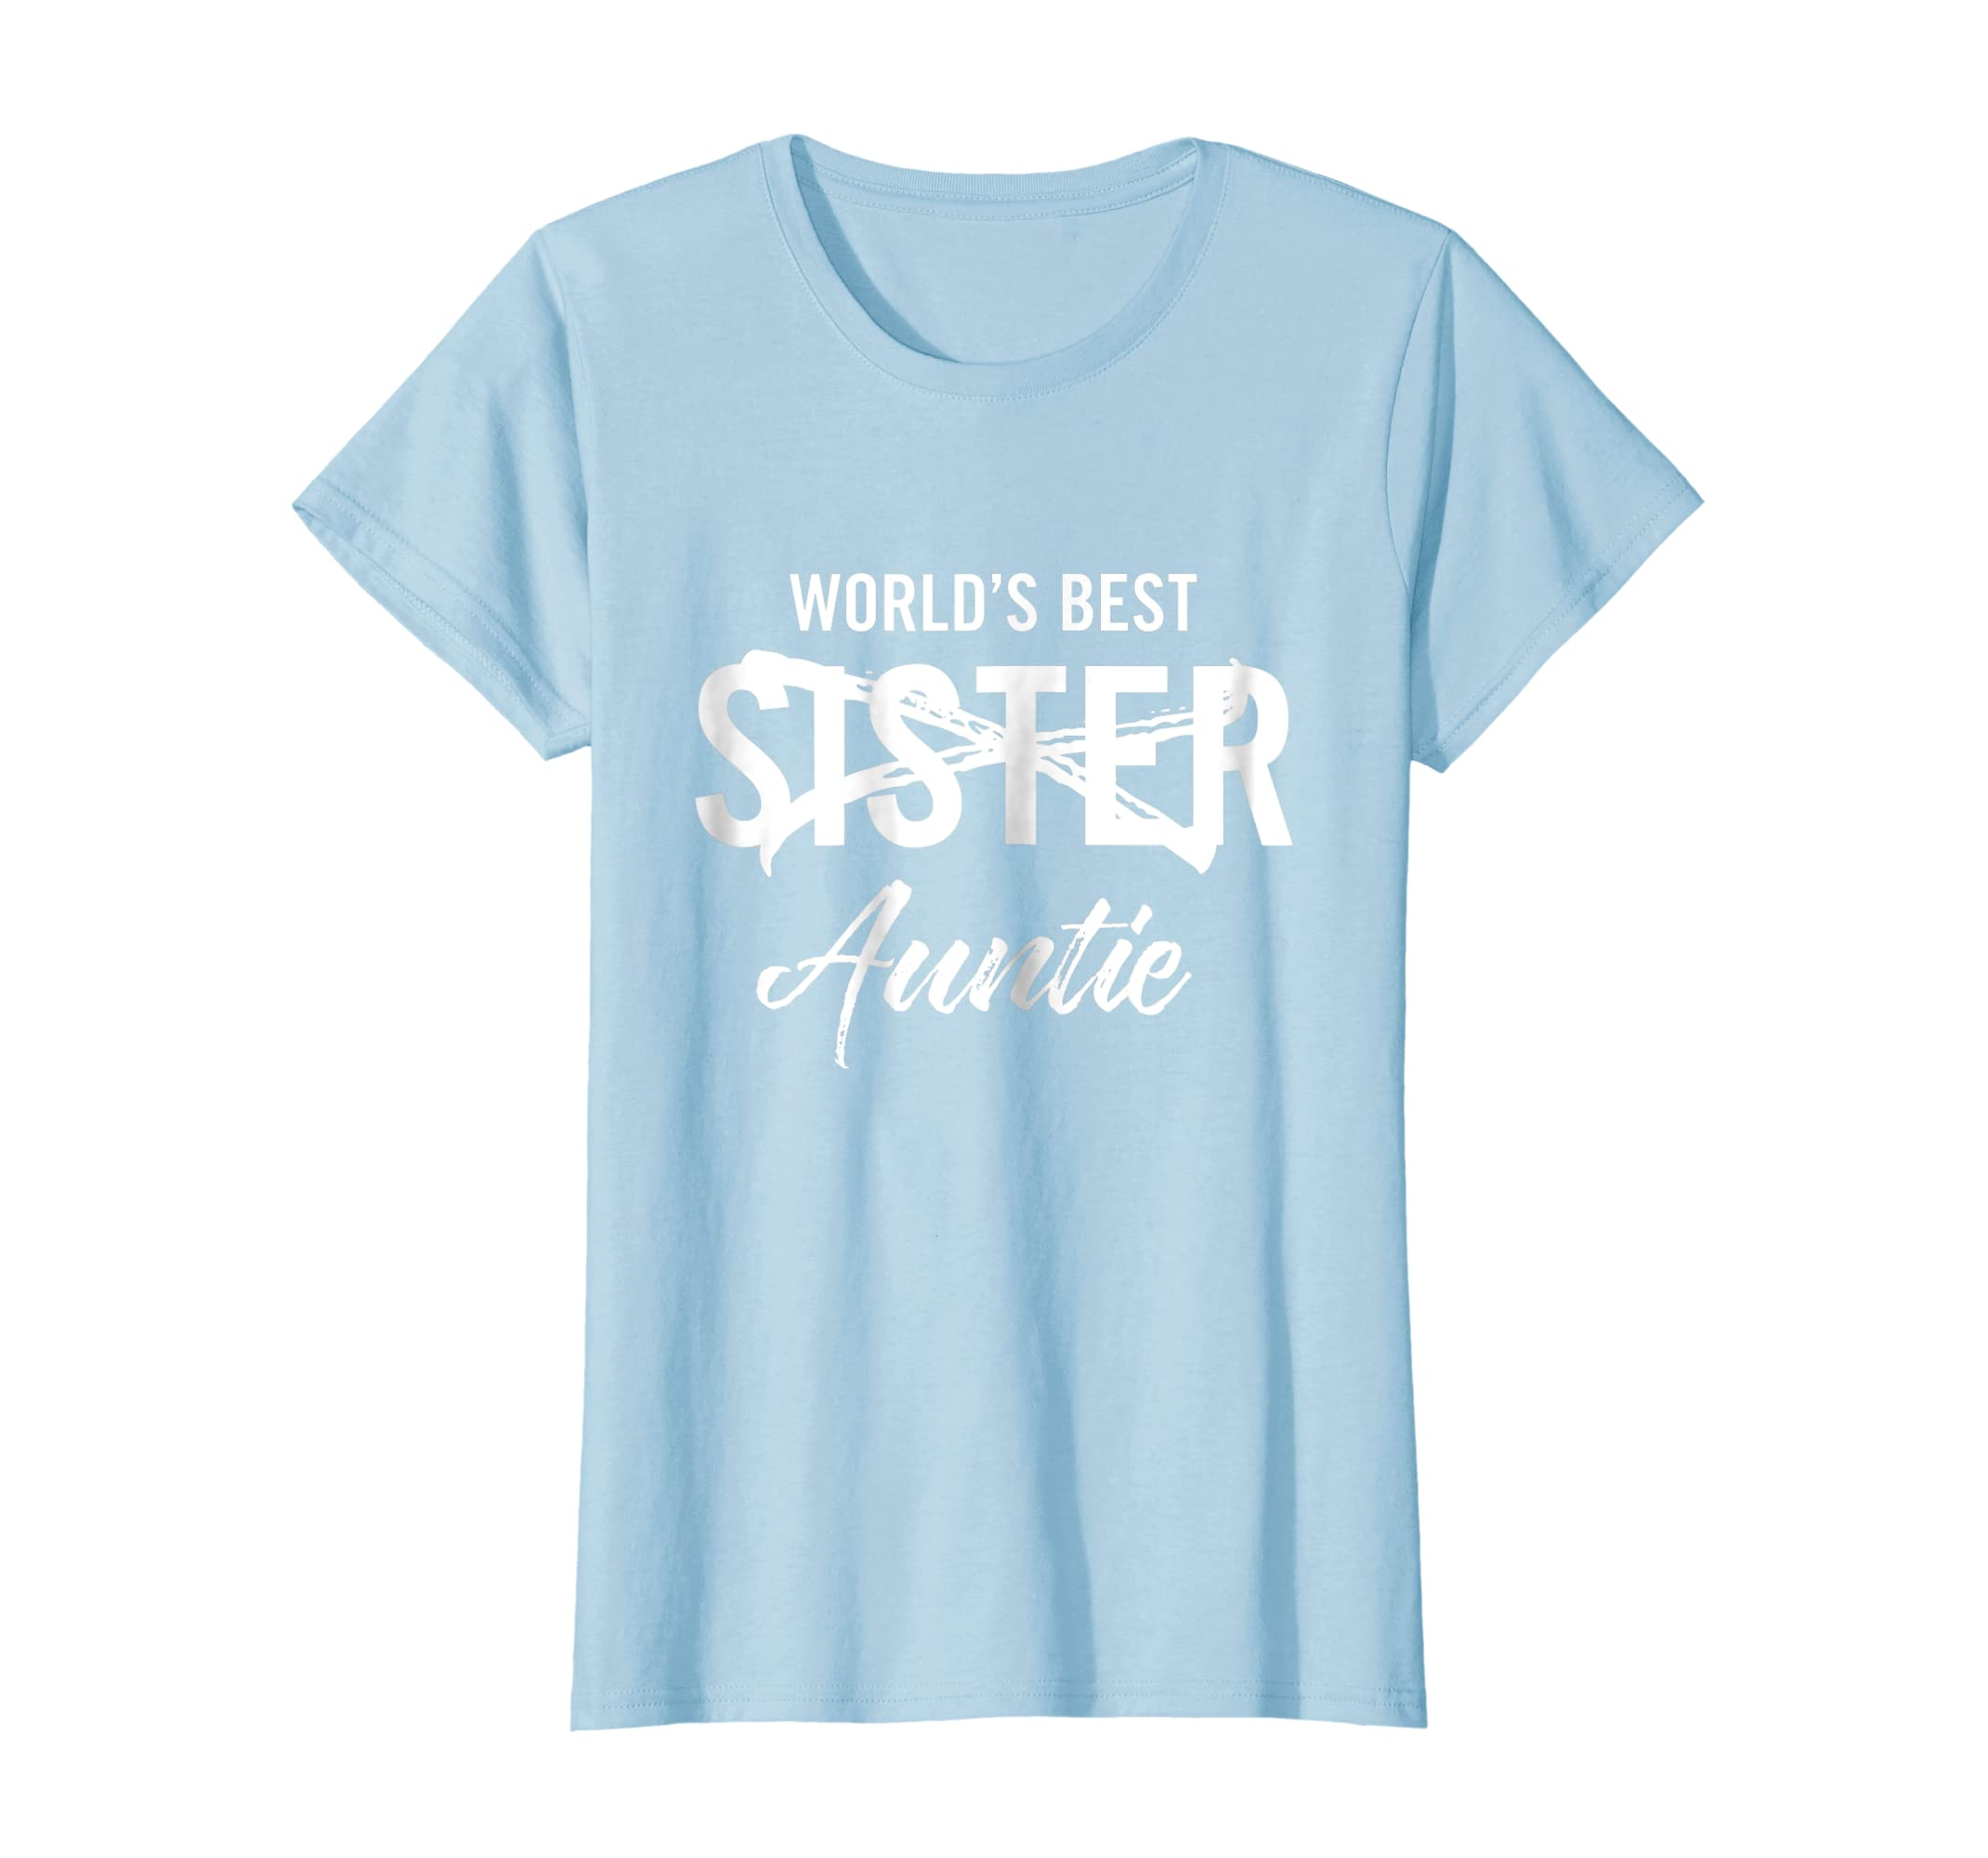 9a237b10 Amazon.com: World's Best Sister Aunt Pregnancy Announcement t shirt:  Clothing